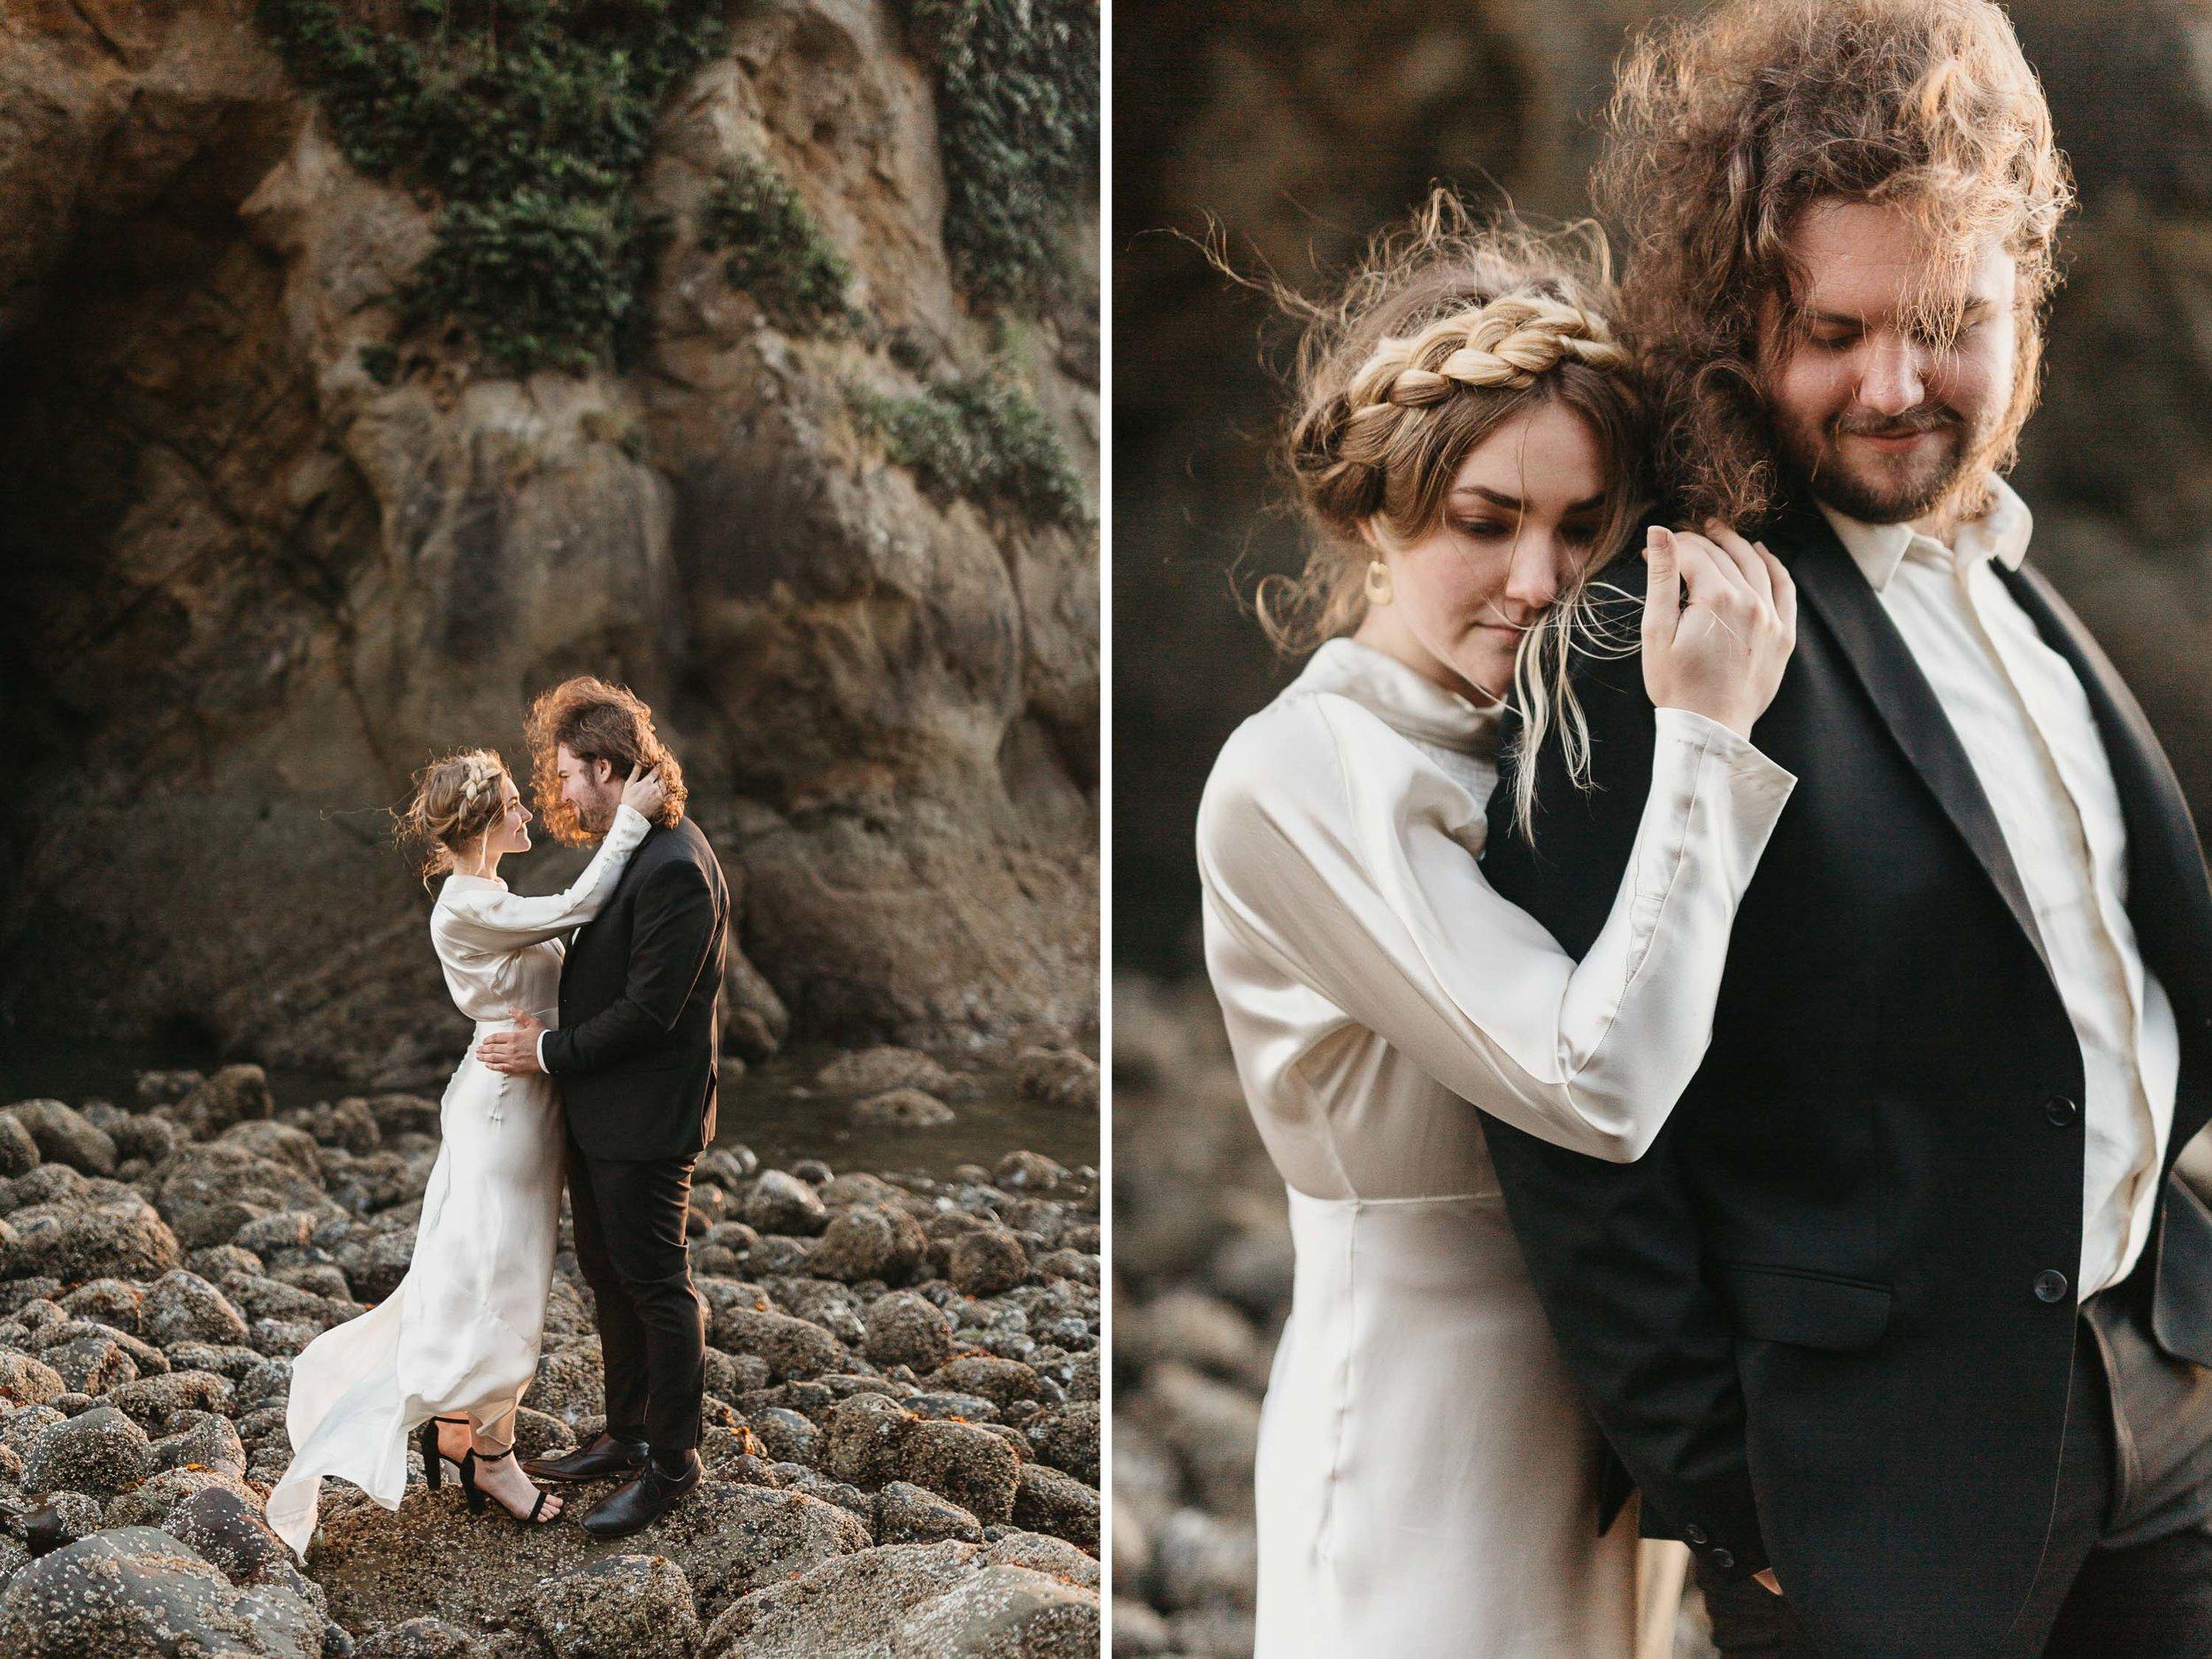 Oregon-Wedding-Photographer-04.jpg